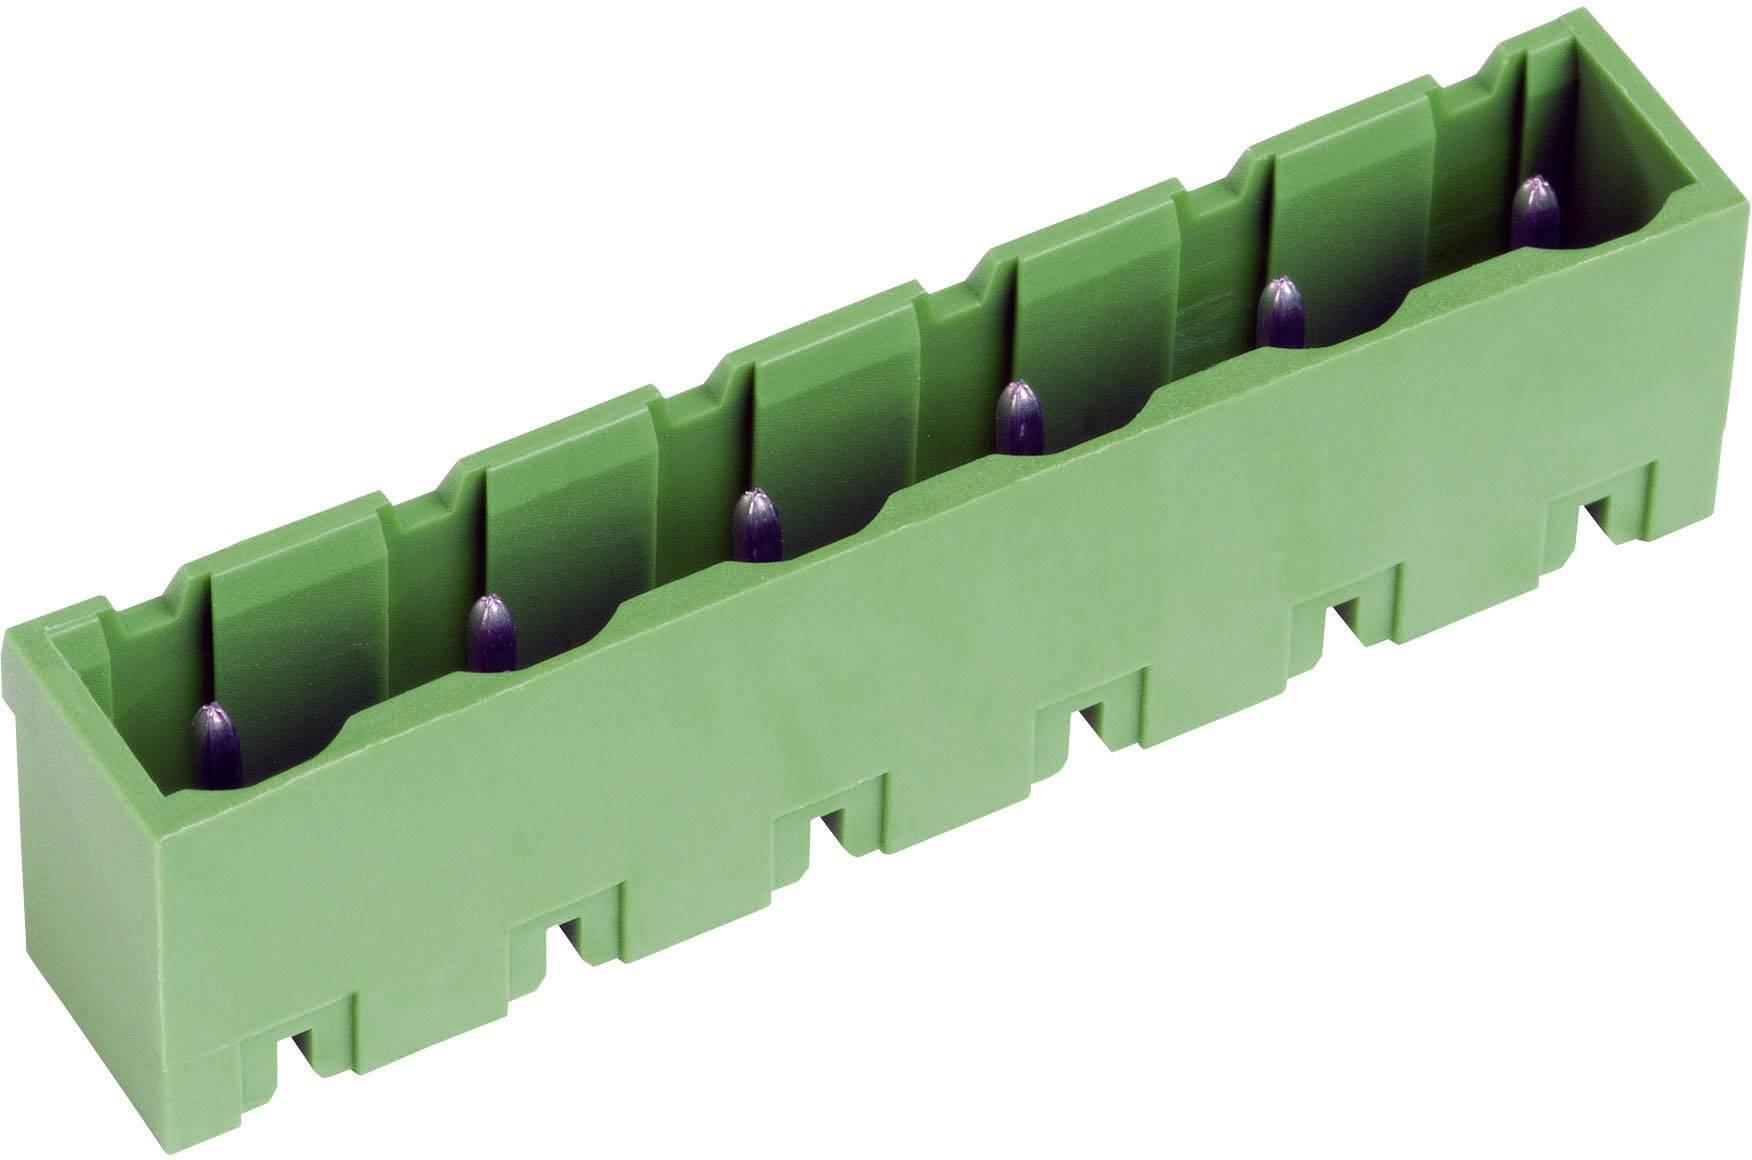 Konektor do DPS PTR STLZ960/10G-7.62-V 50960105121D, 76.20 mm, pólů 10, rozteč 7.62 mm, 1 ks